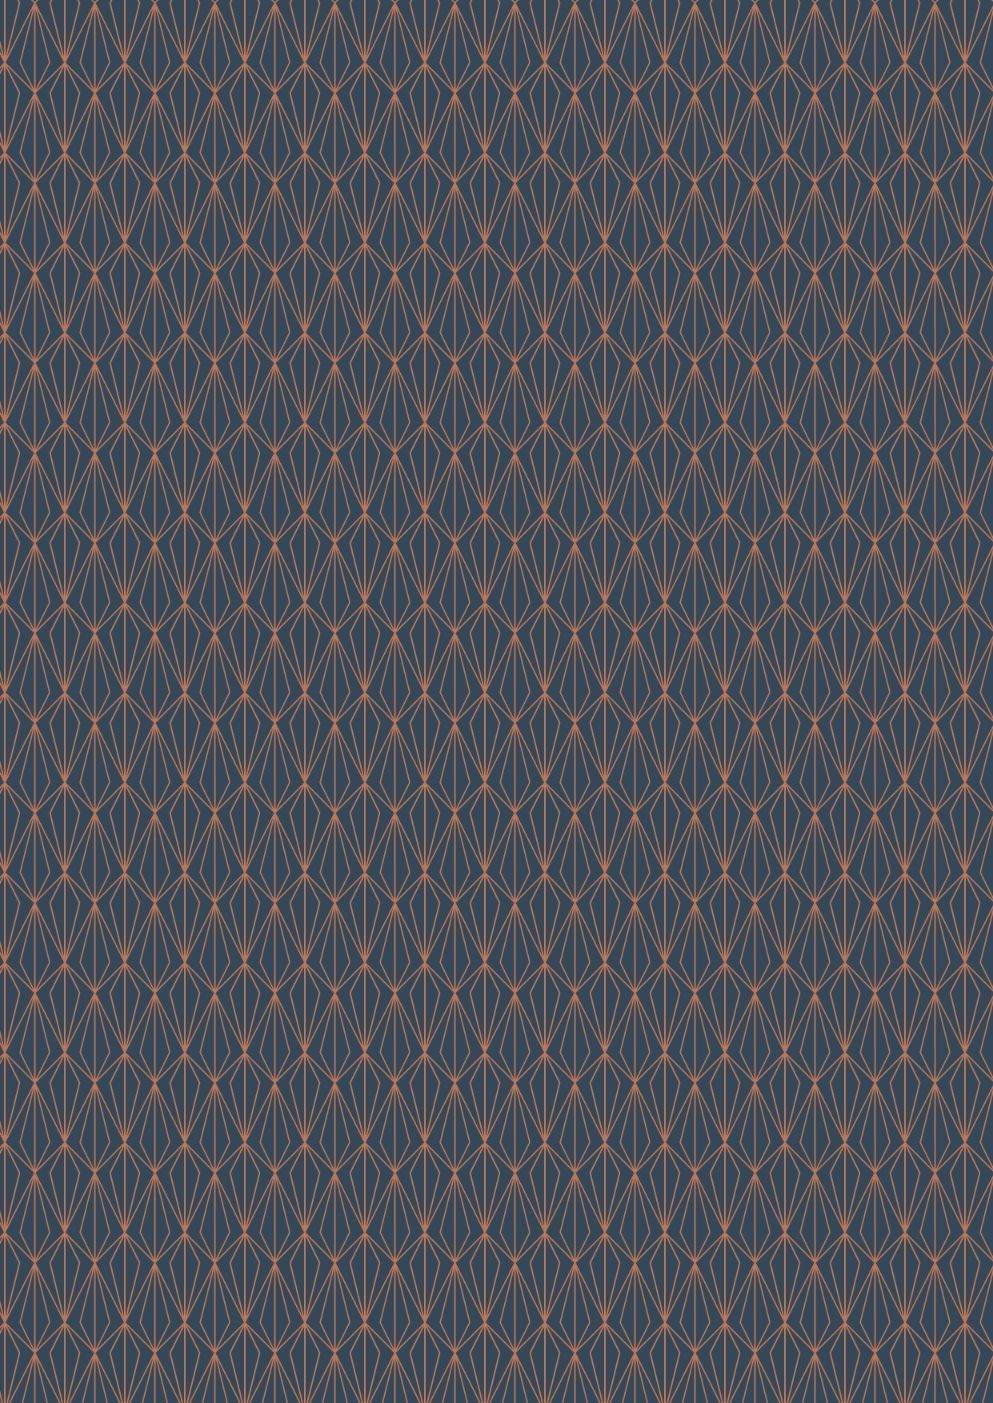 Marvellous Metallics Copper geometric on navy